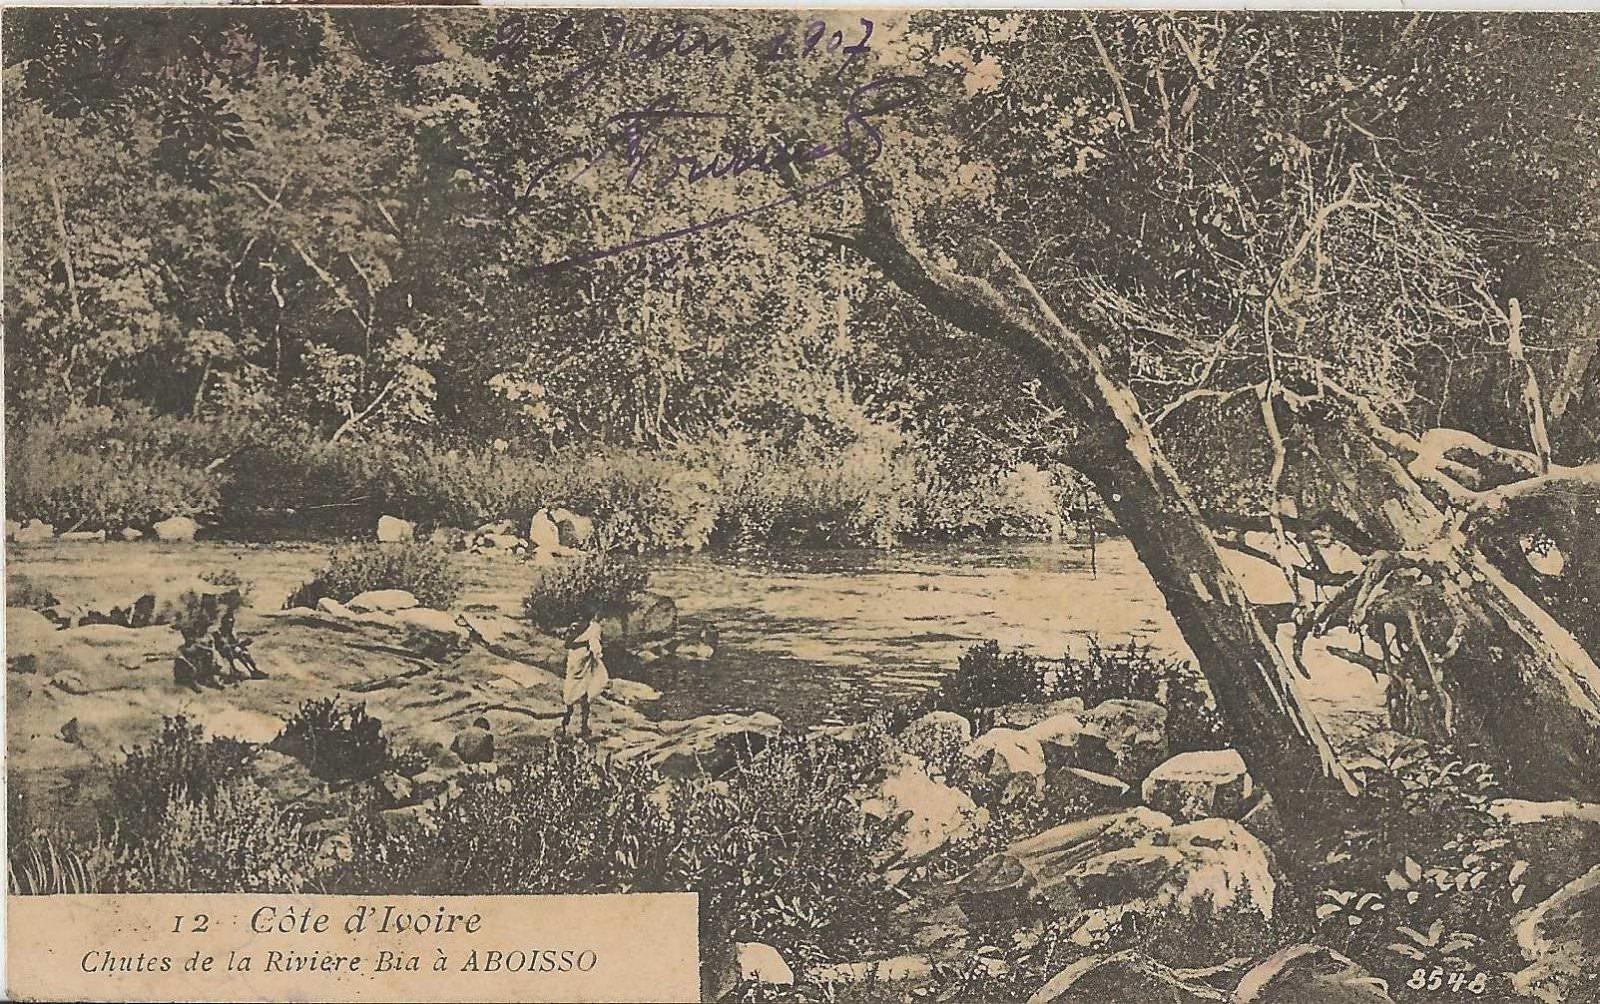 Aboisso 1907